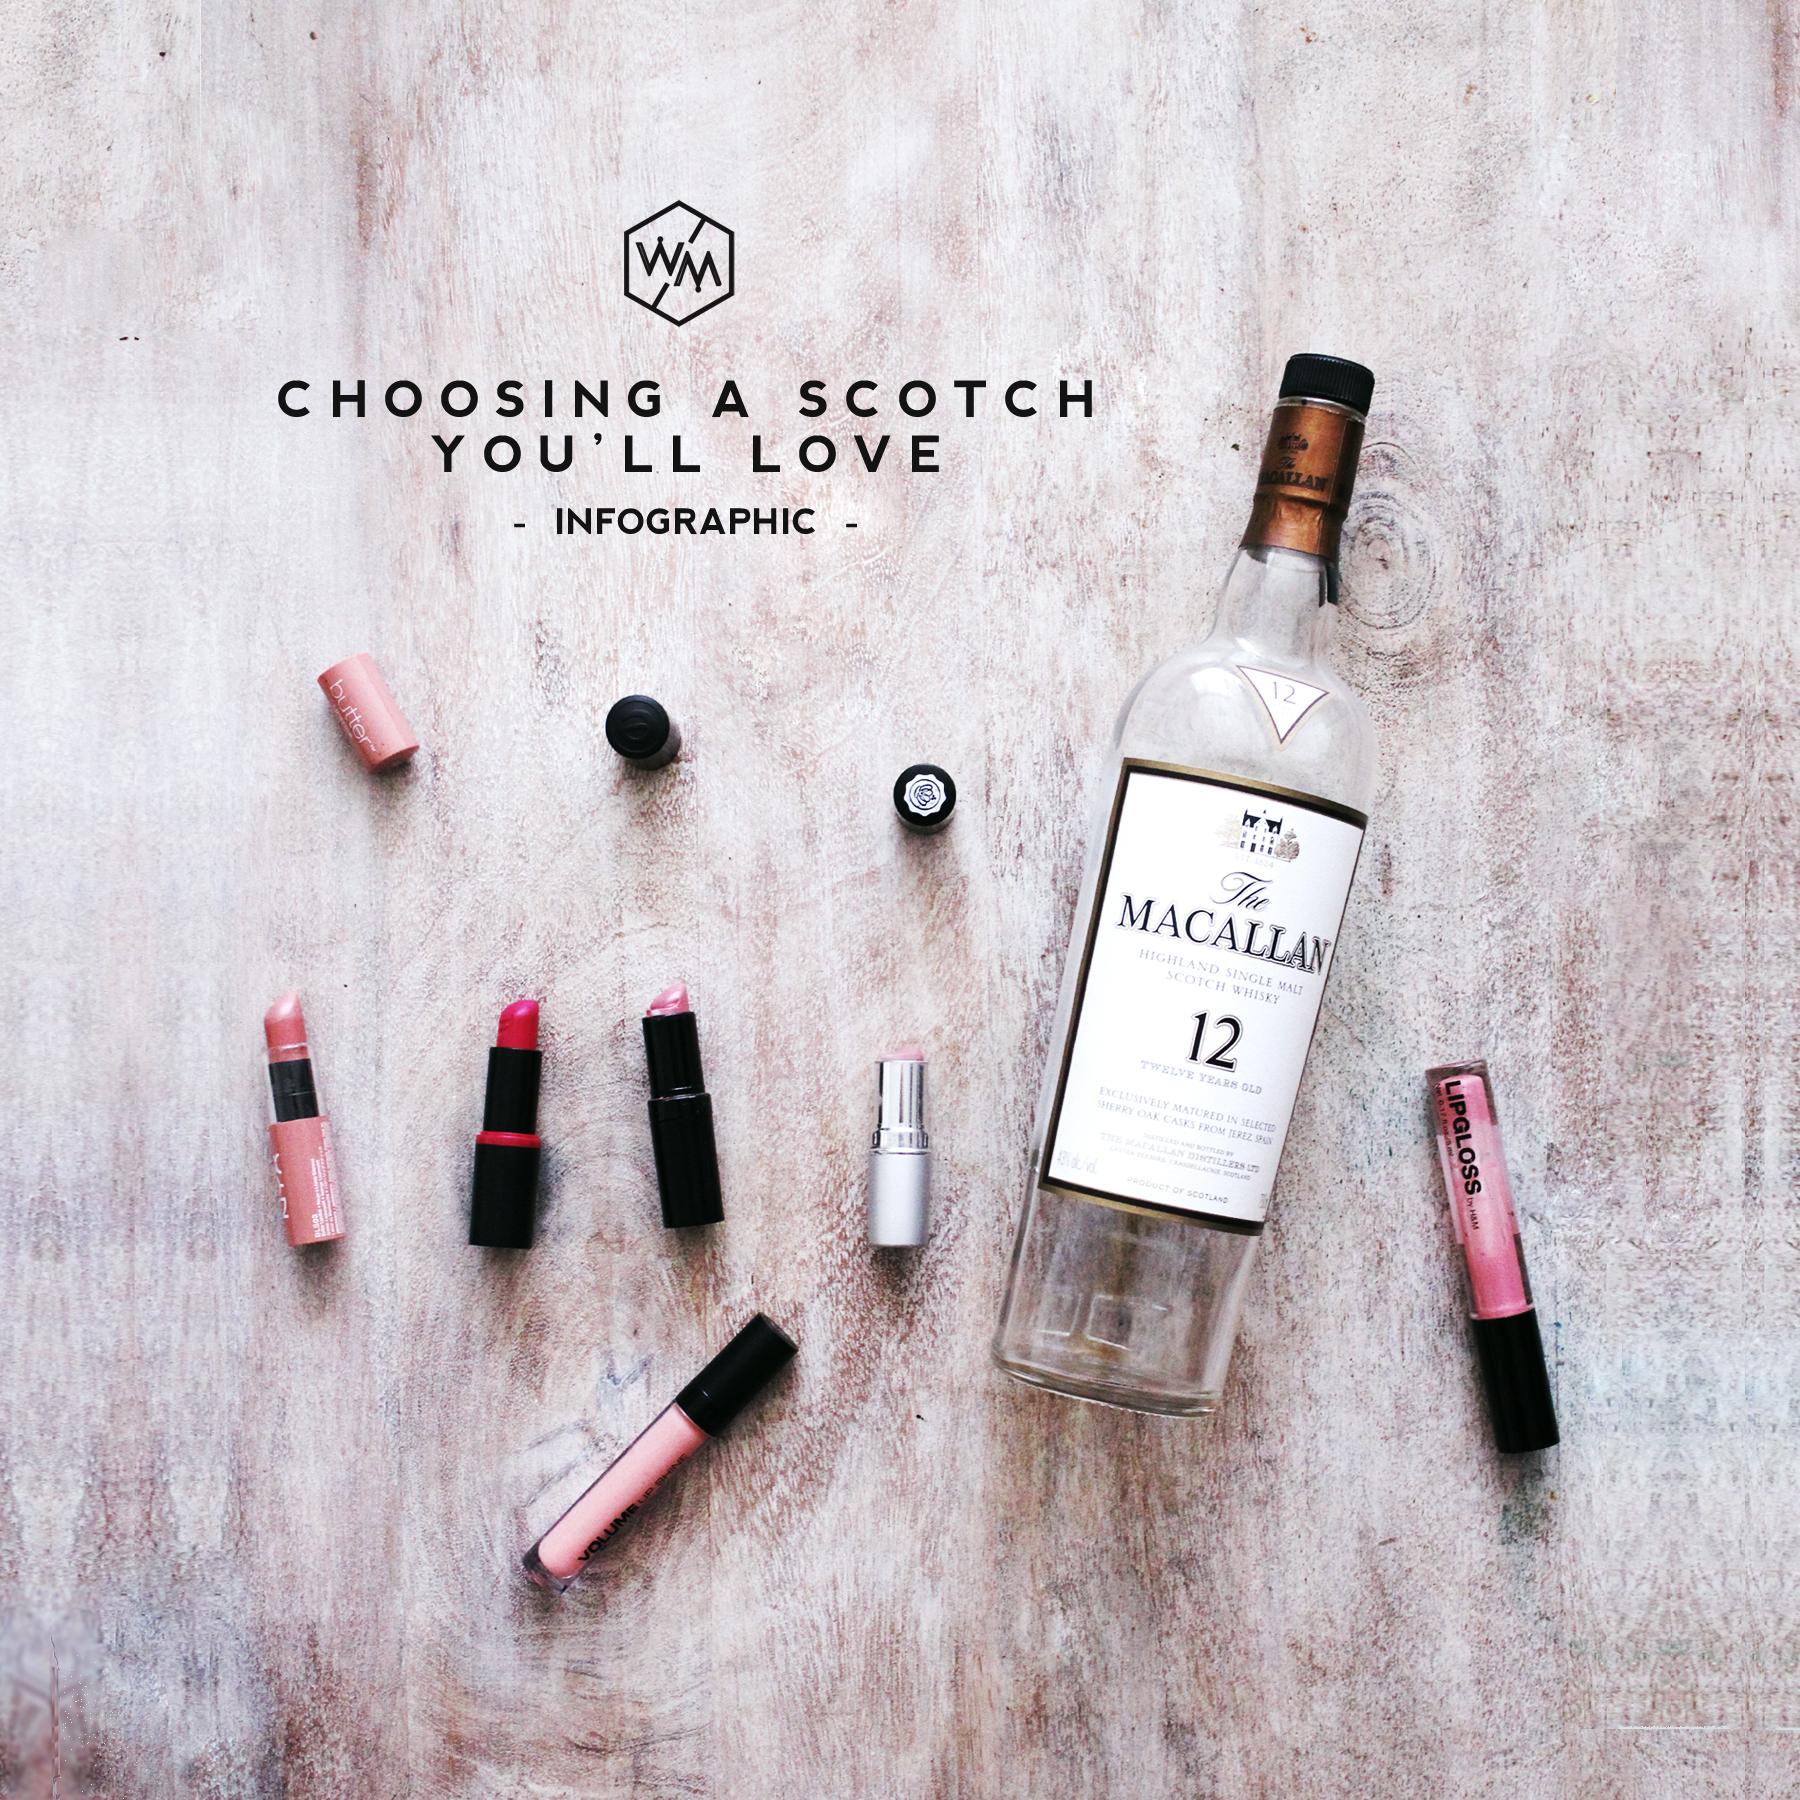 which scotch you like